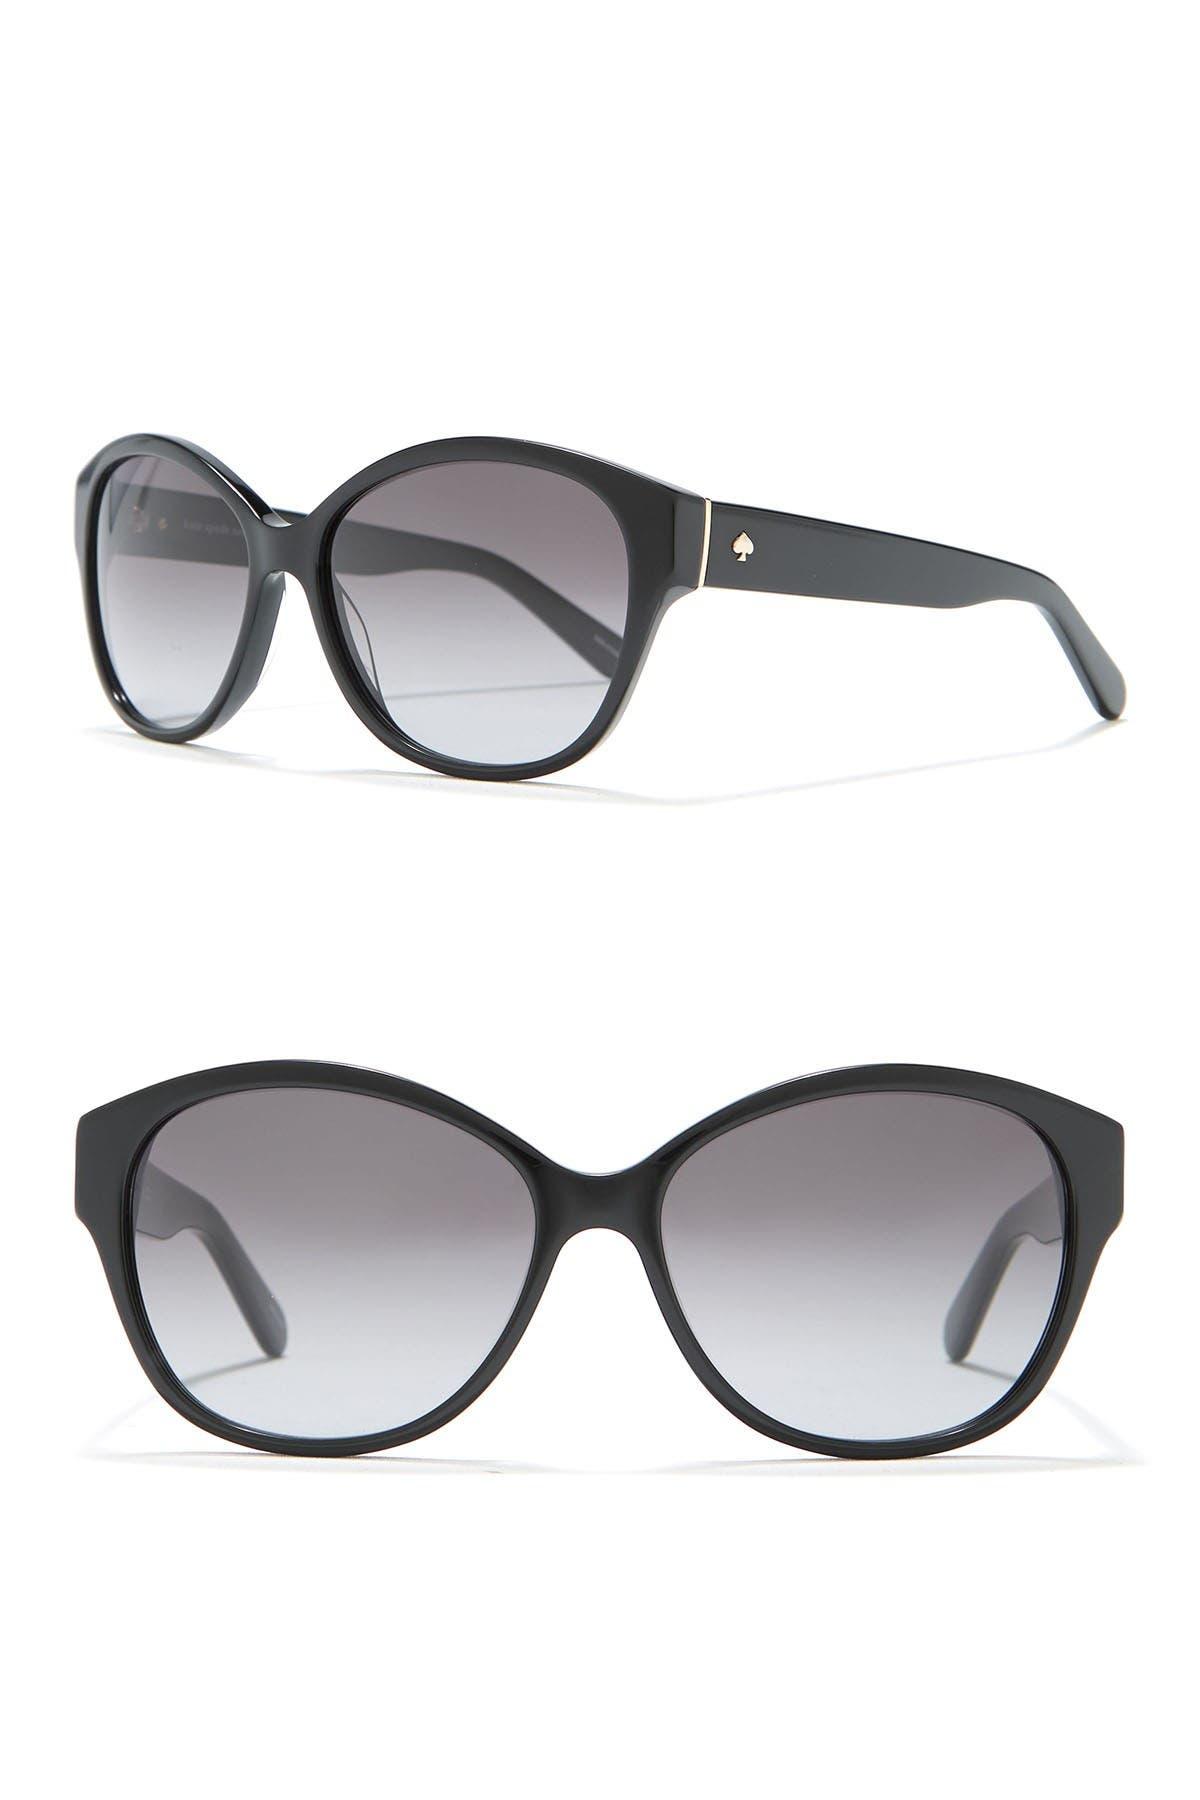 Image of kate spade new york kiers 56mm round sunglasses